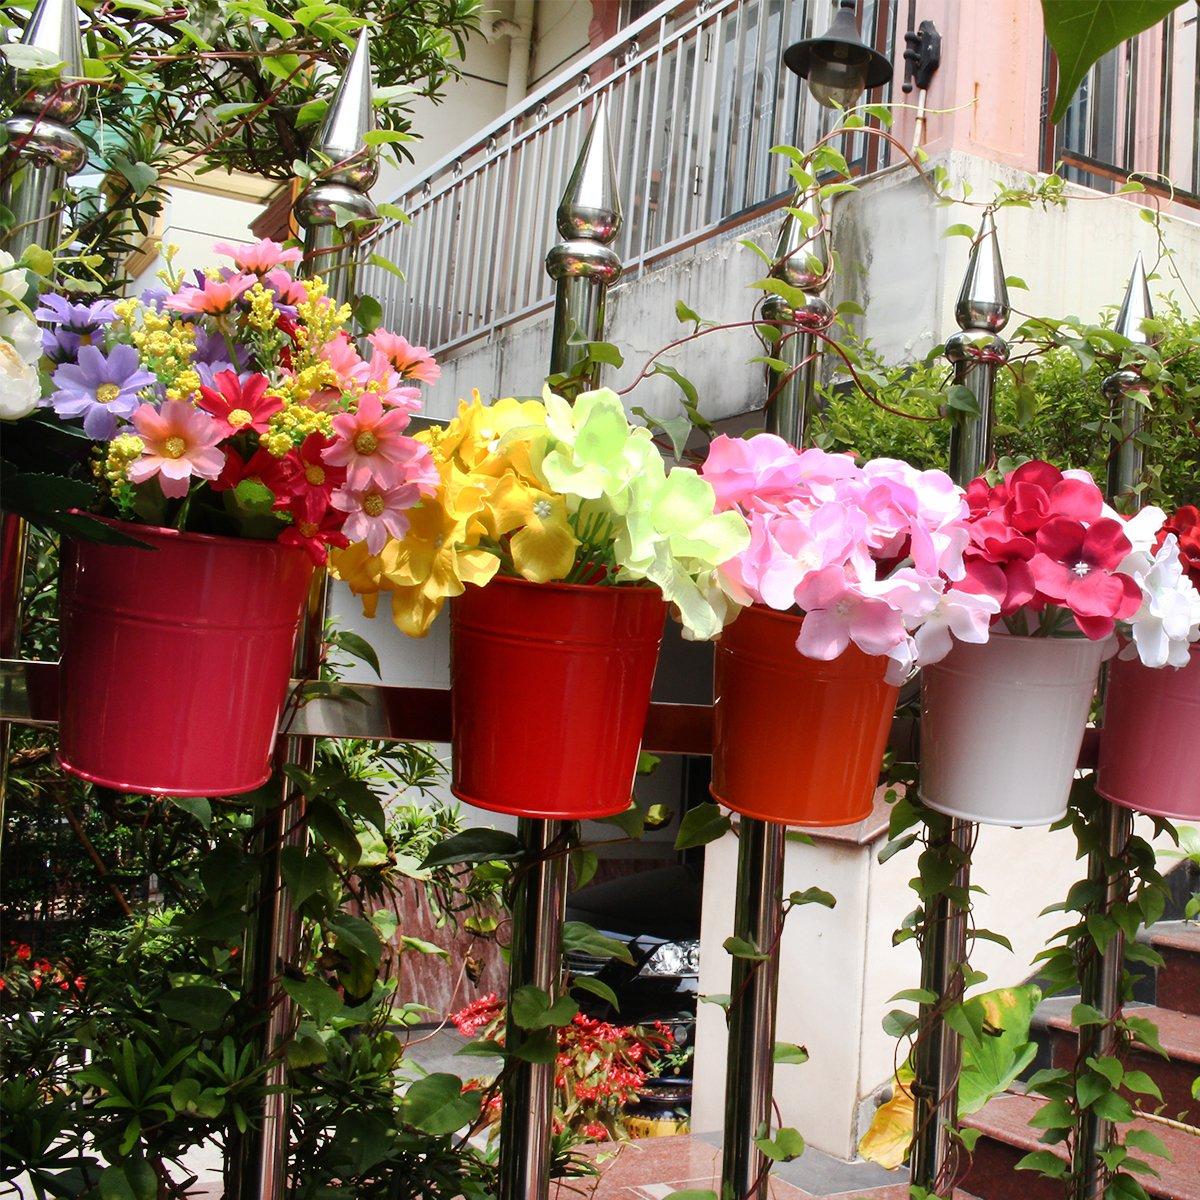 Metall, Eisen, Blumentopf Vase Hängen Balkon Garten Pflanzer Home ...